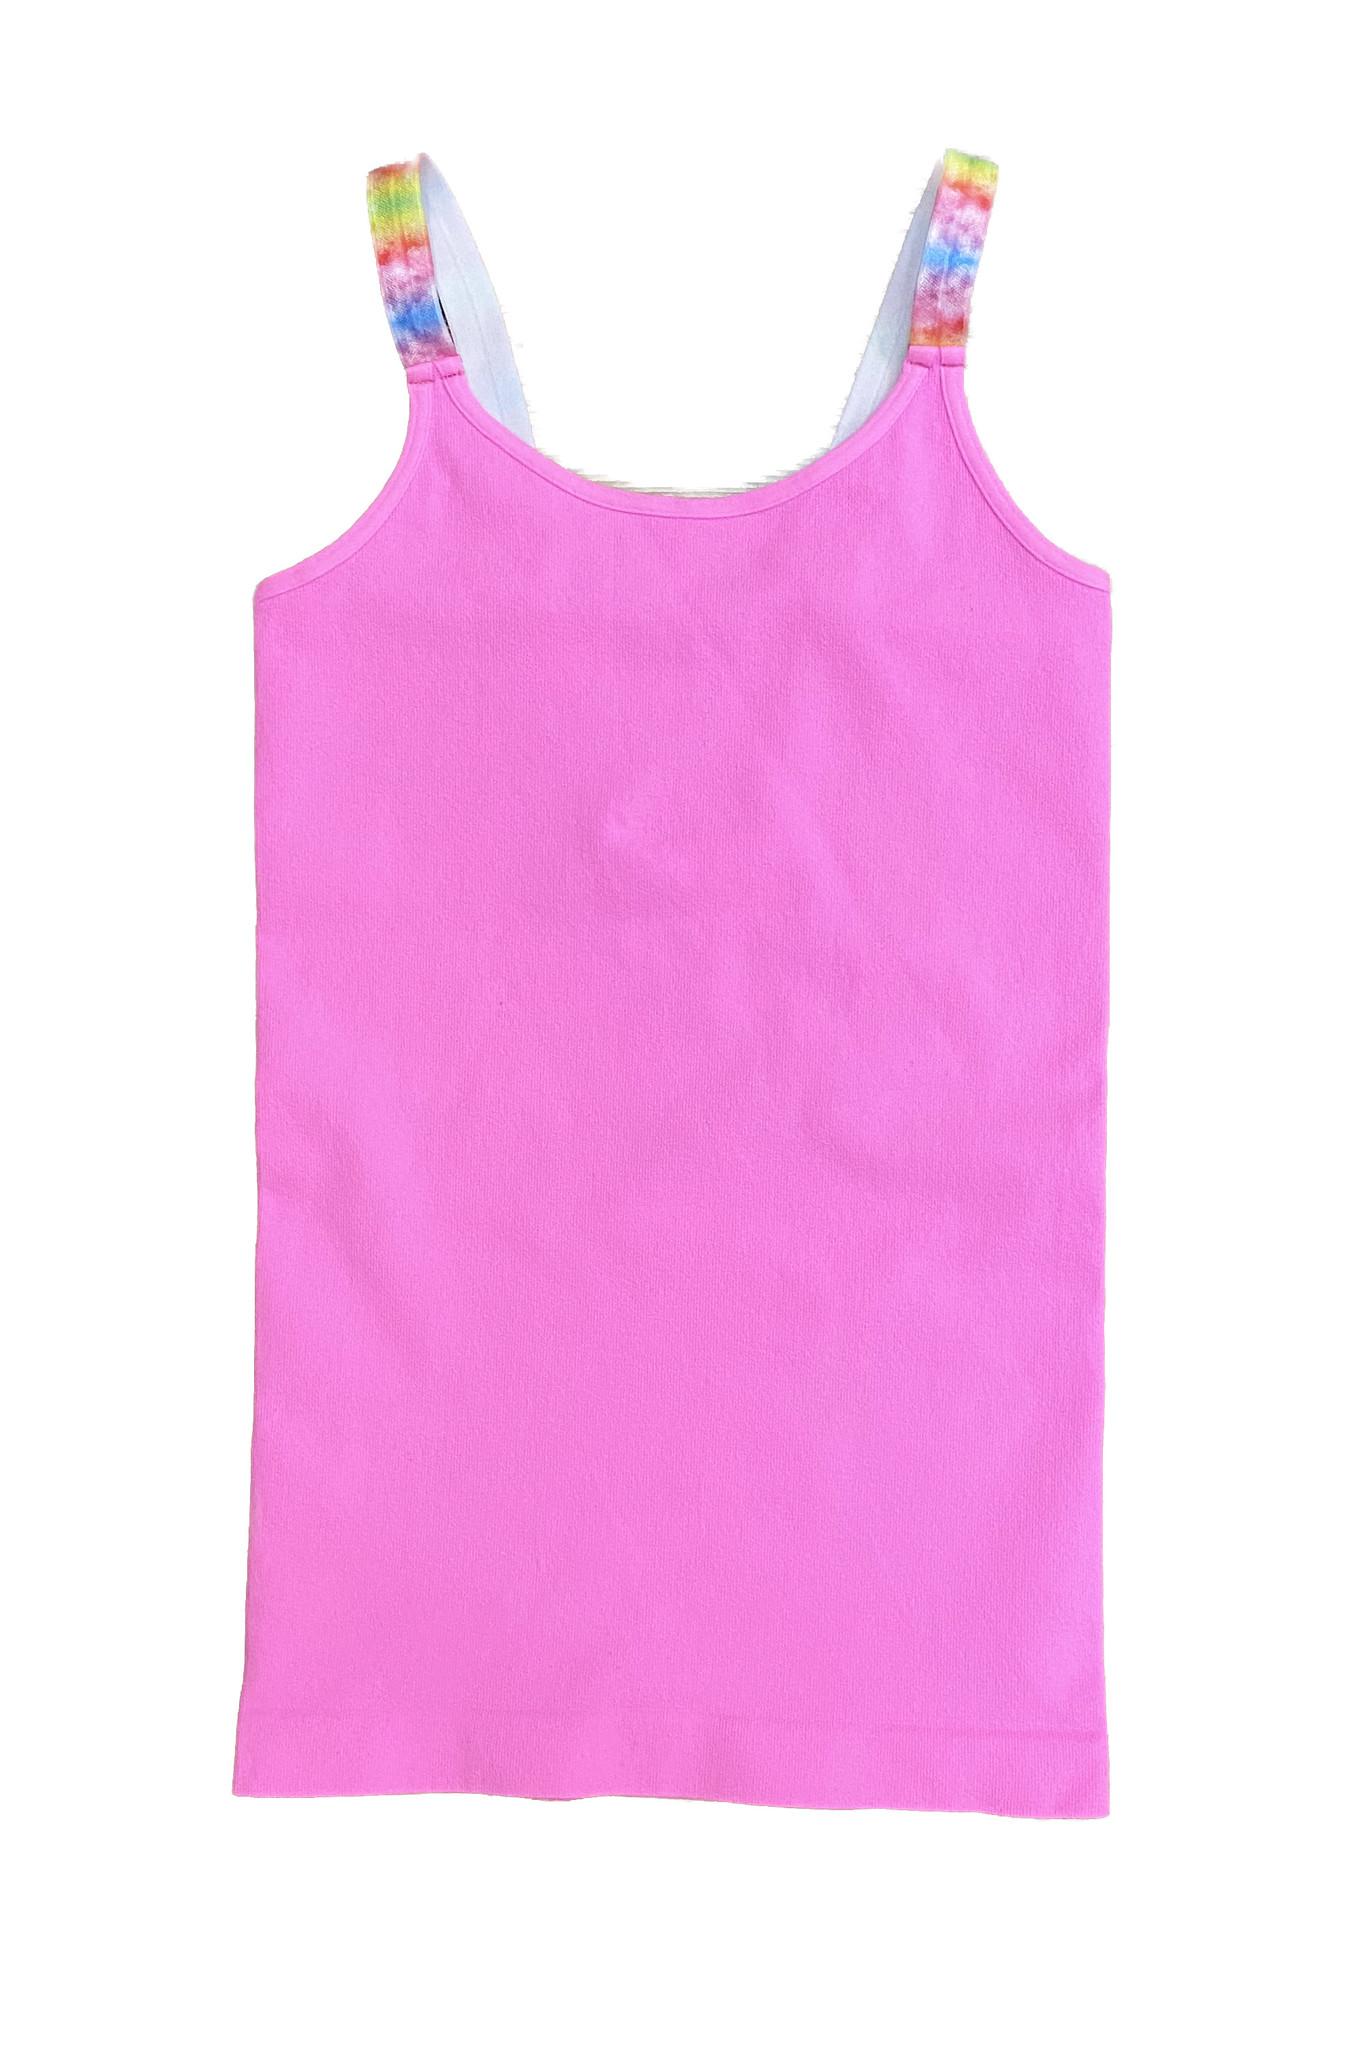 Malibu Sugar Neon Pink w Tie Dye Strap Cami